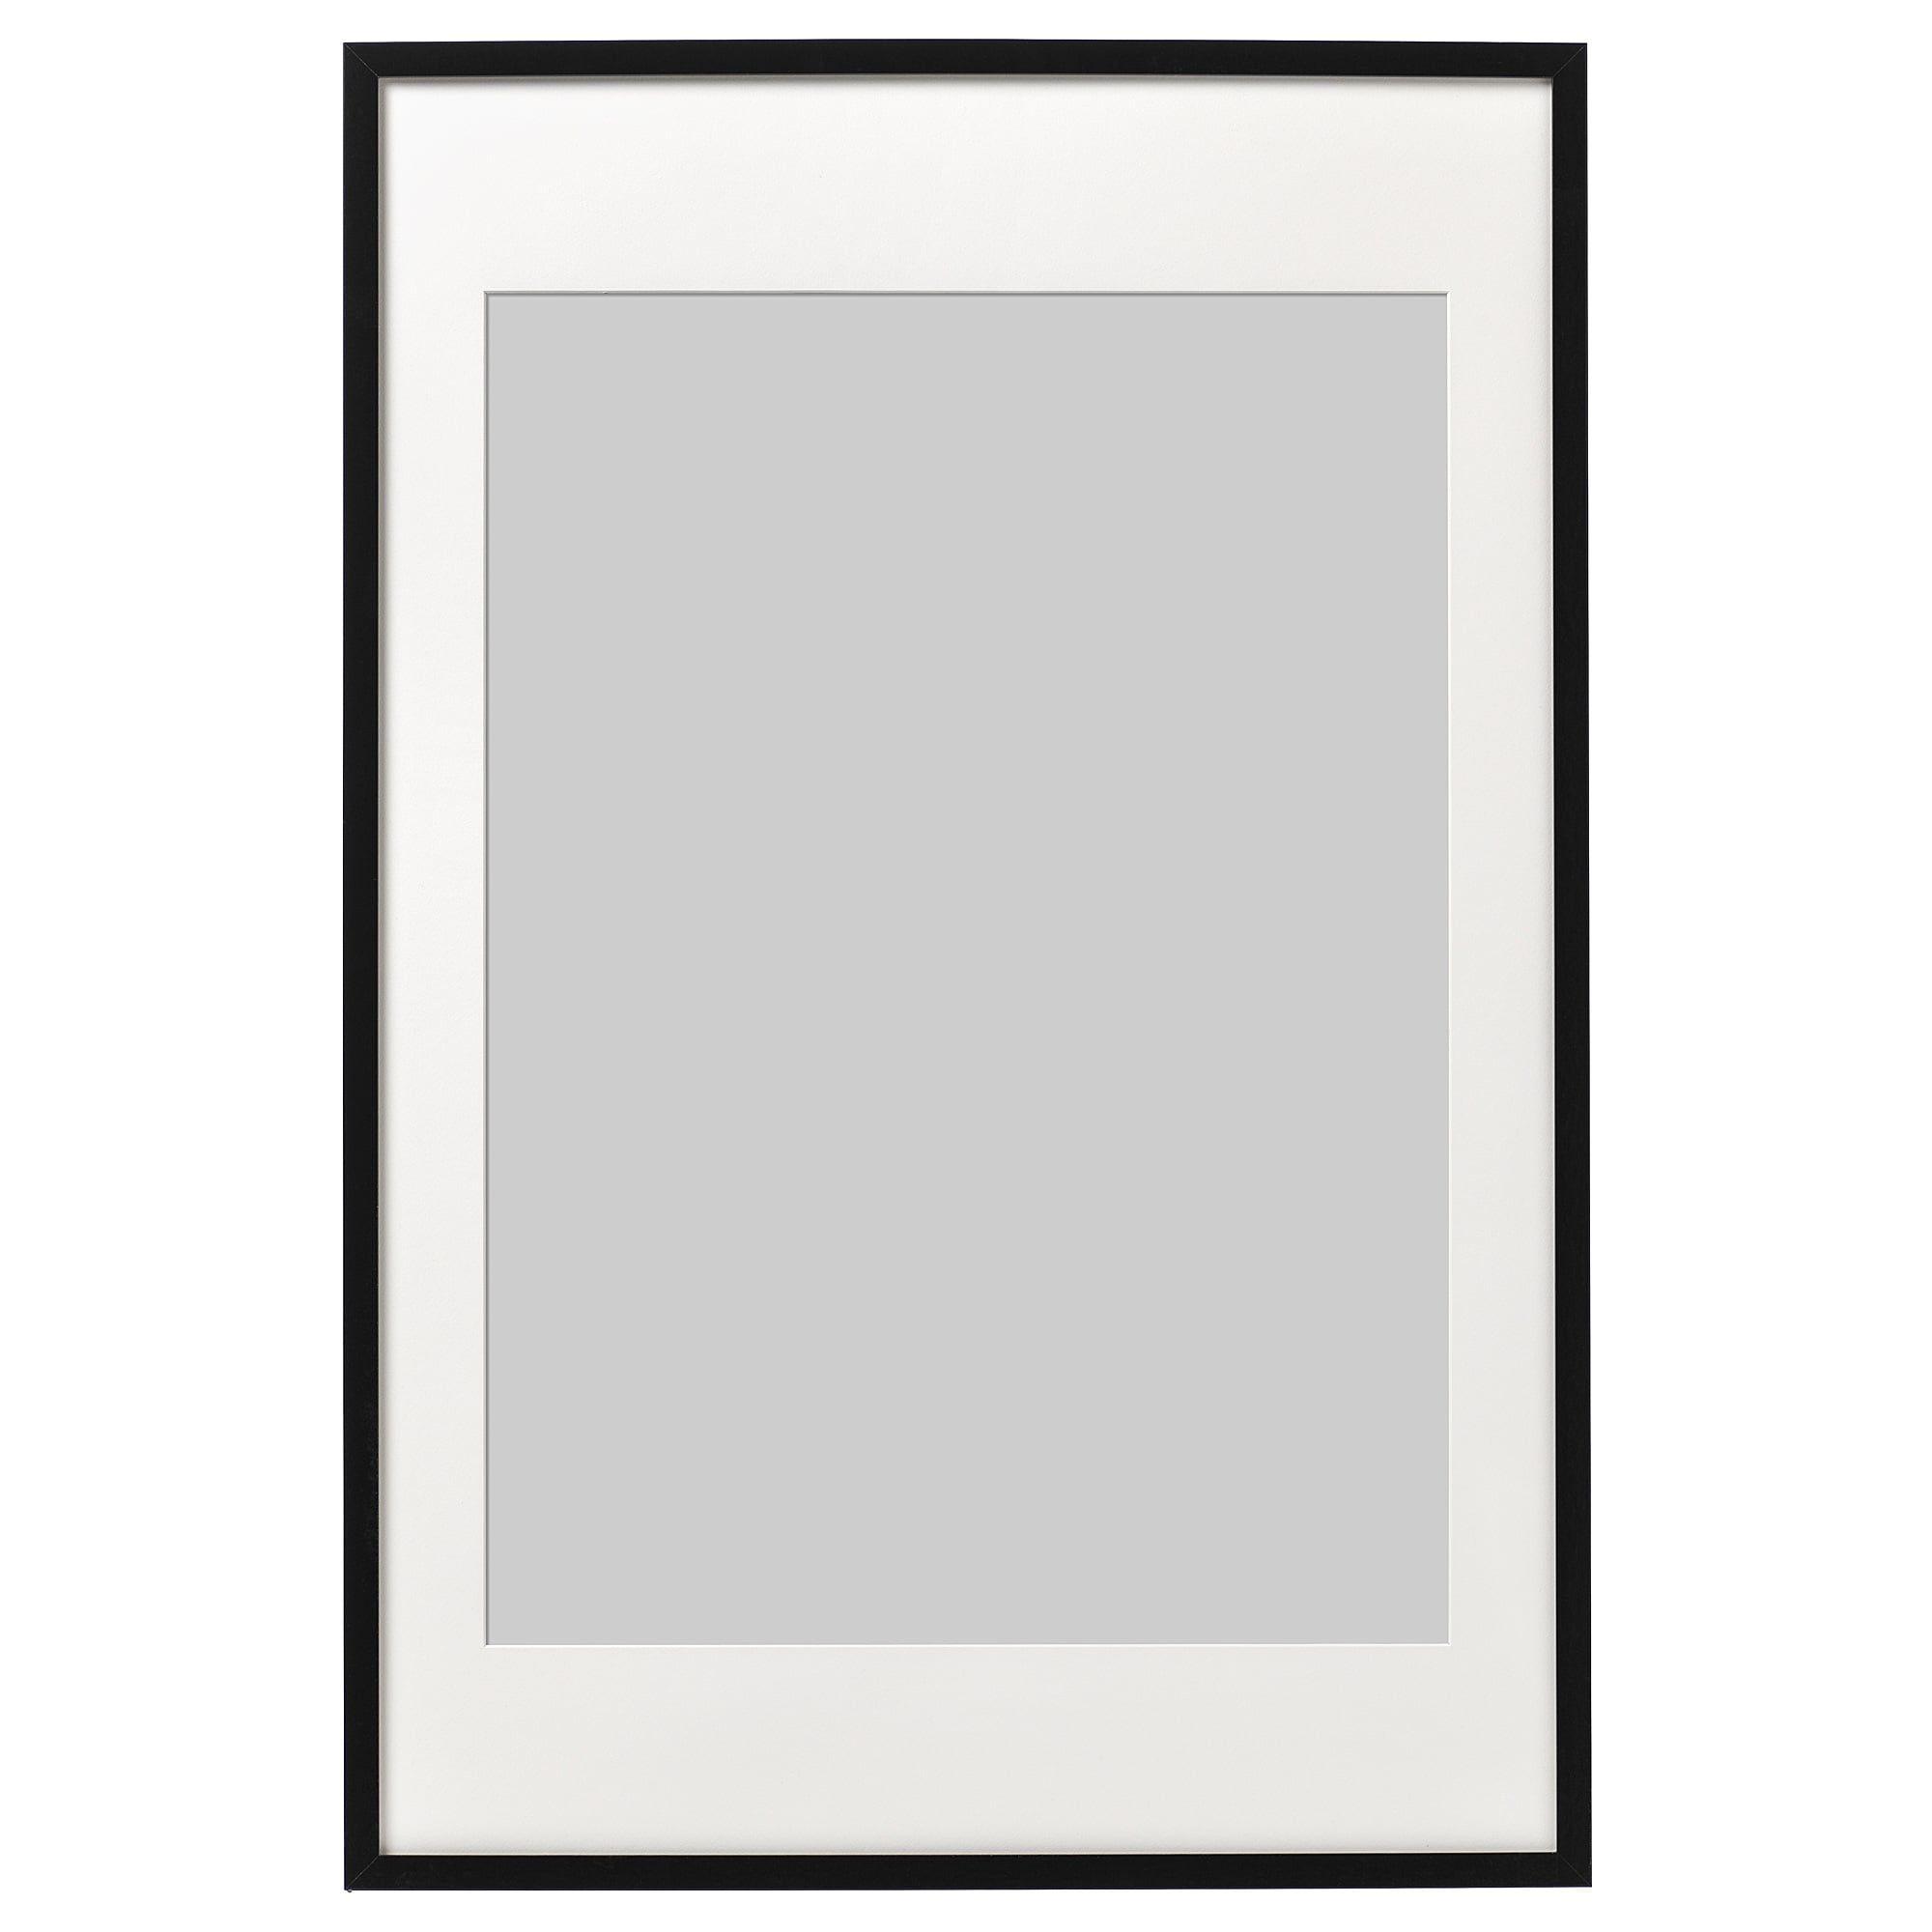 RIBBA Fotolijst, zwart, 61x91 cm IKEA in 2020 Ribba